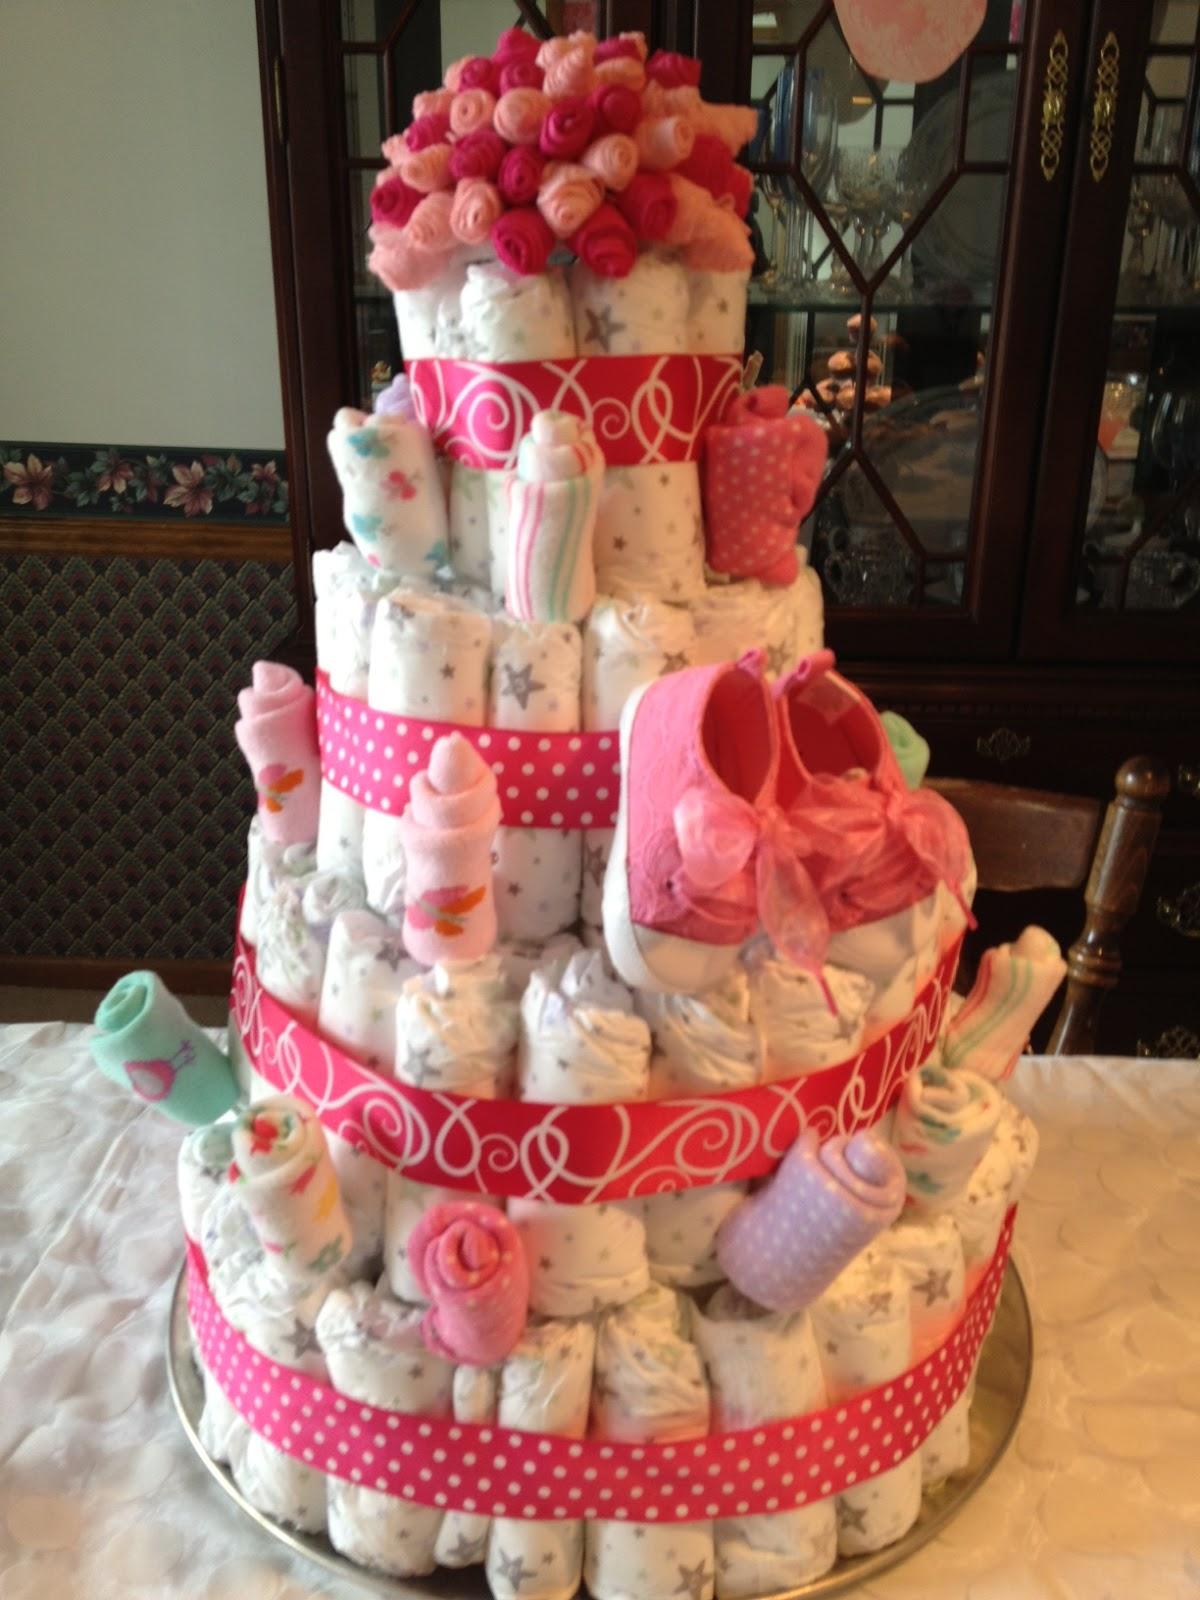 Texas Health Moms DIY pink baby shower